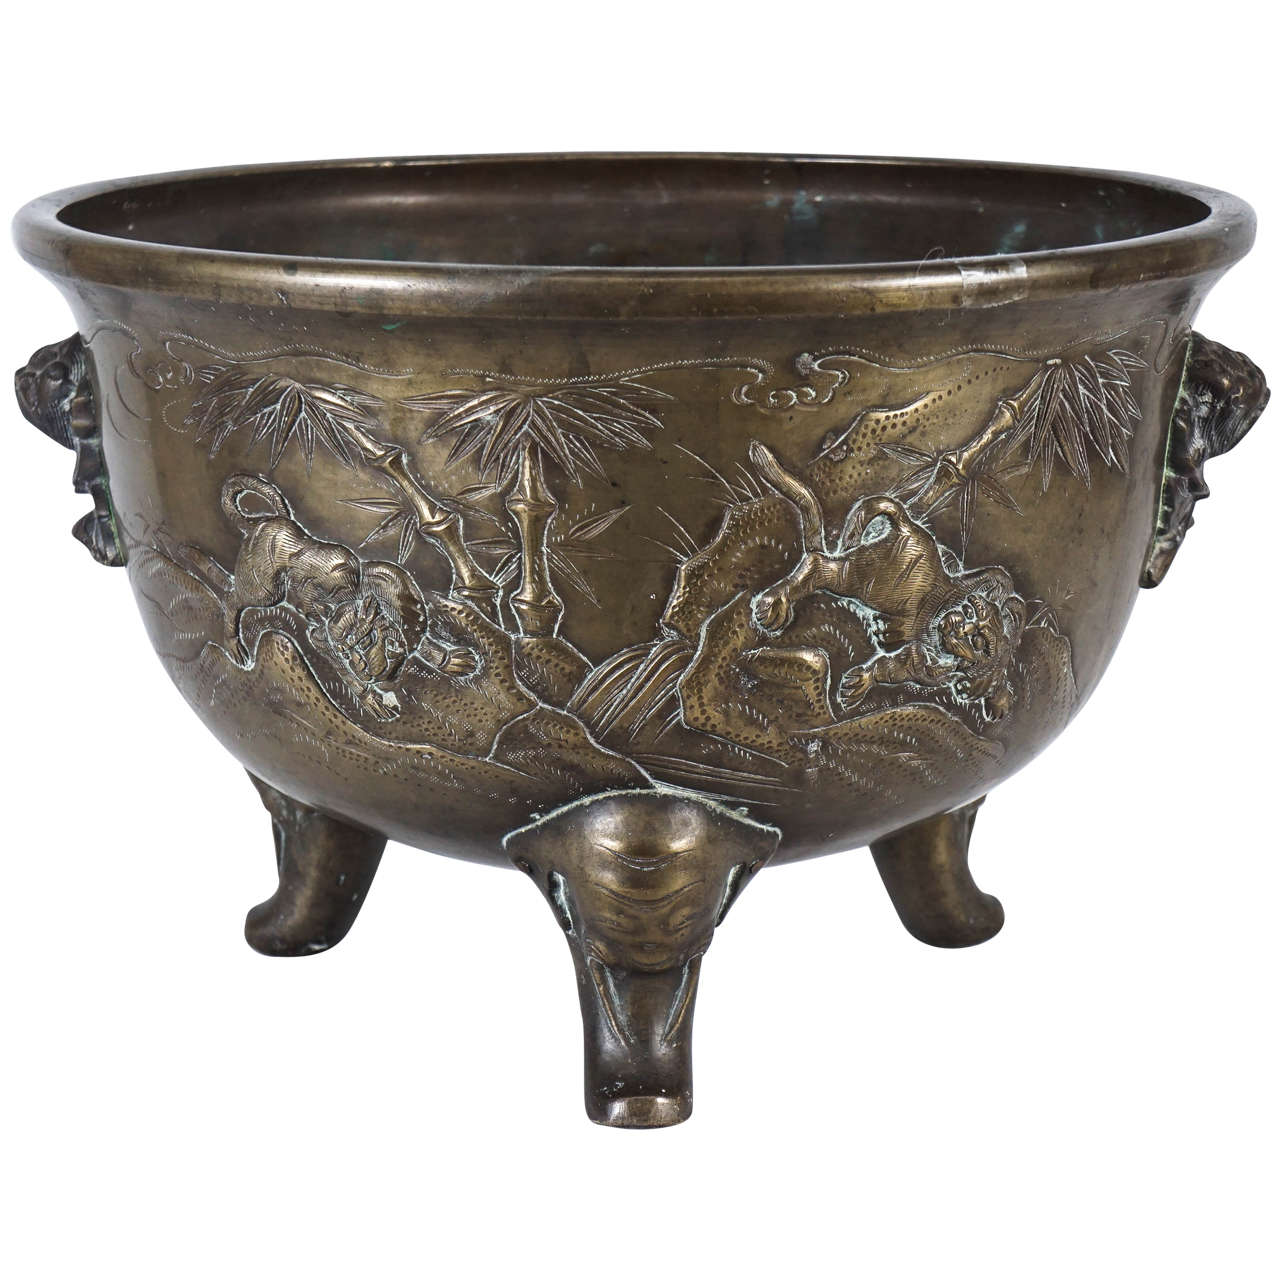 Japanese Late 19th Century Meiji Period Cast Bronze Planter